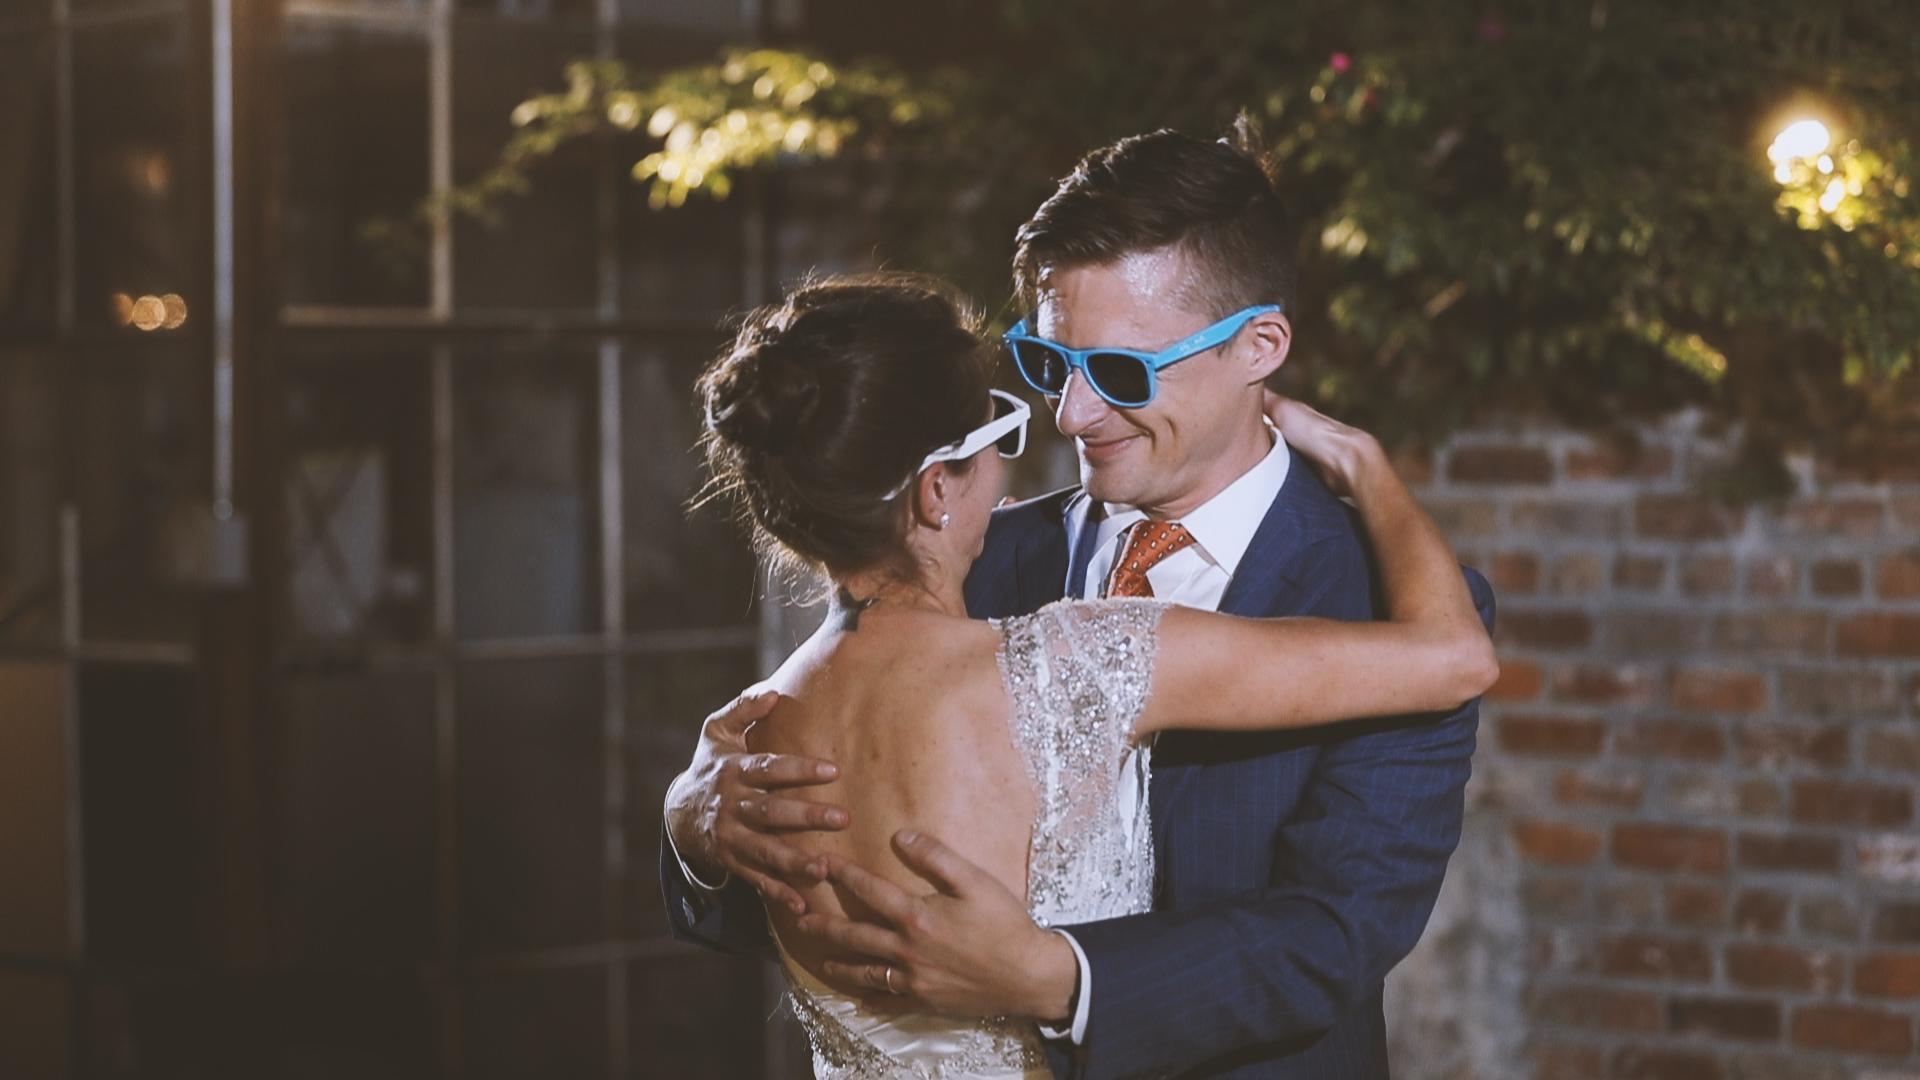 Race and Religious Wedding - Bride Film